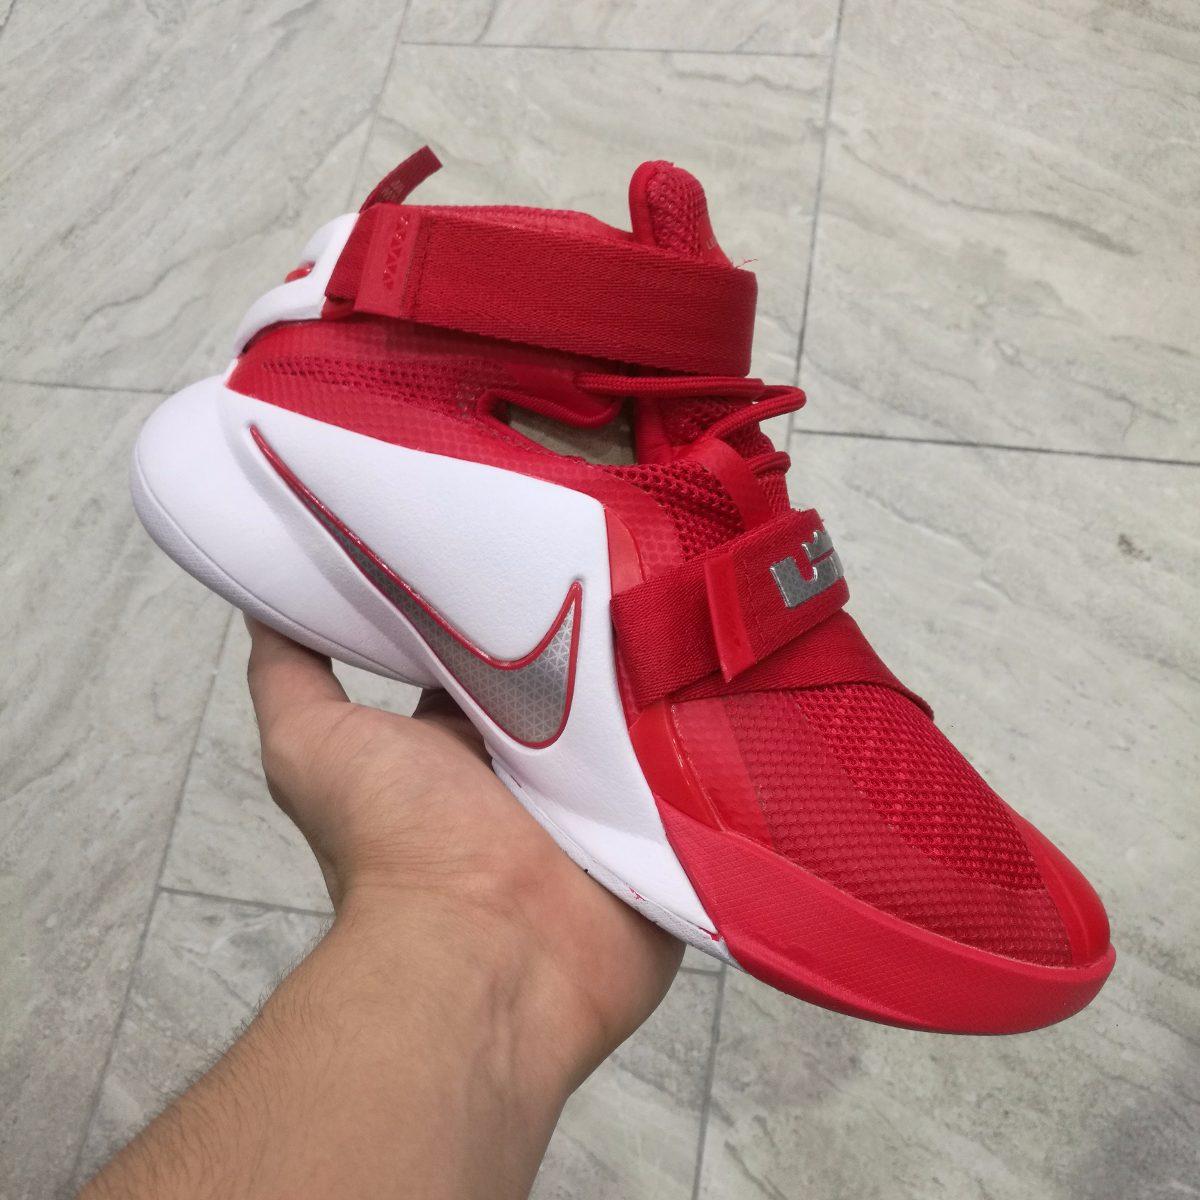 Nike LeBron rojo